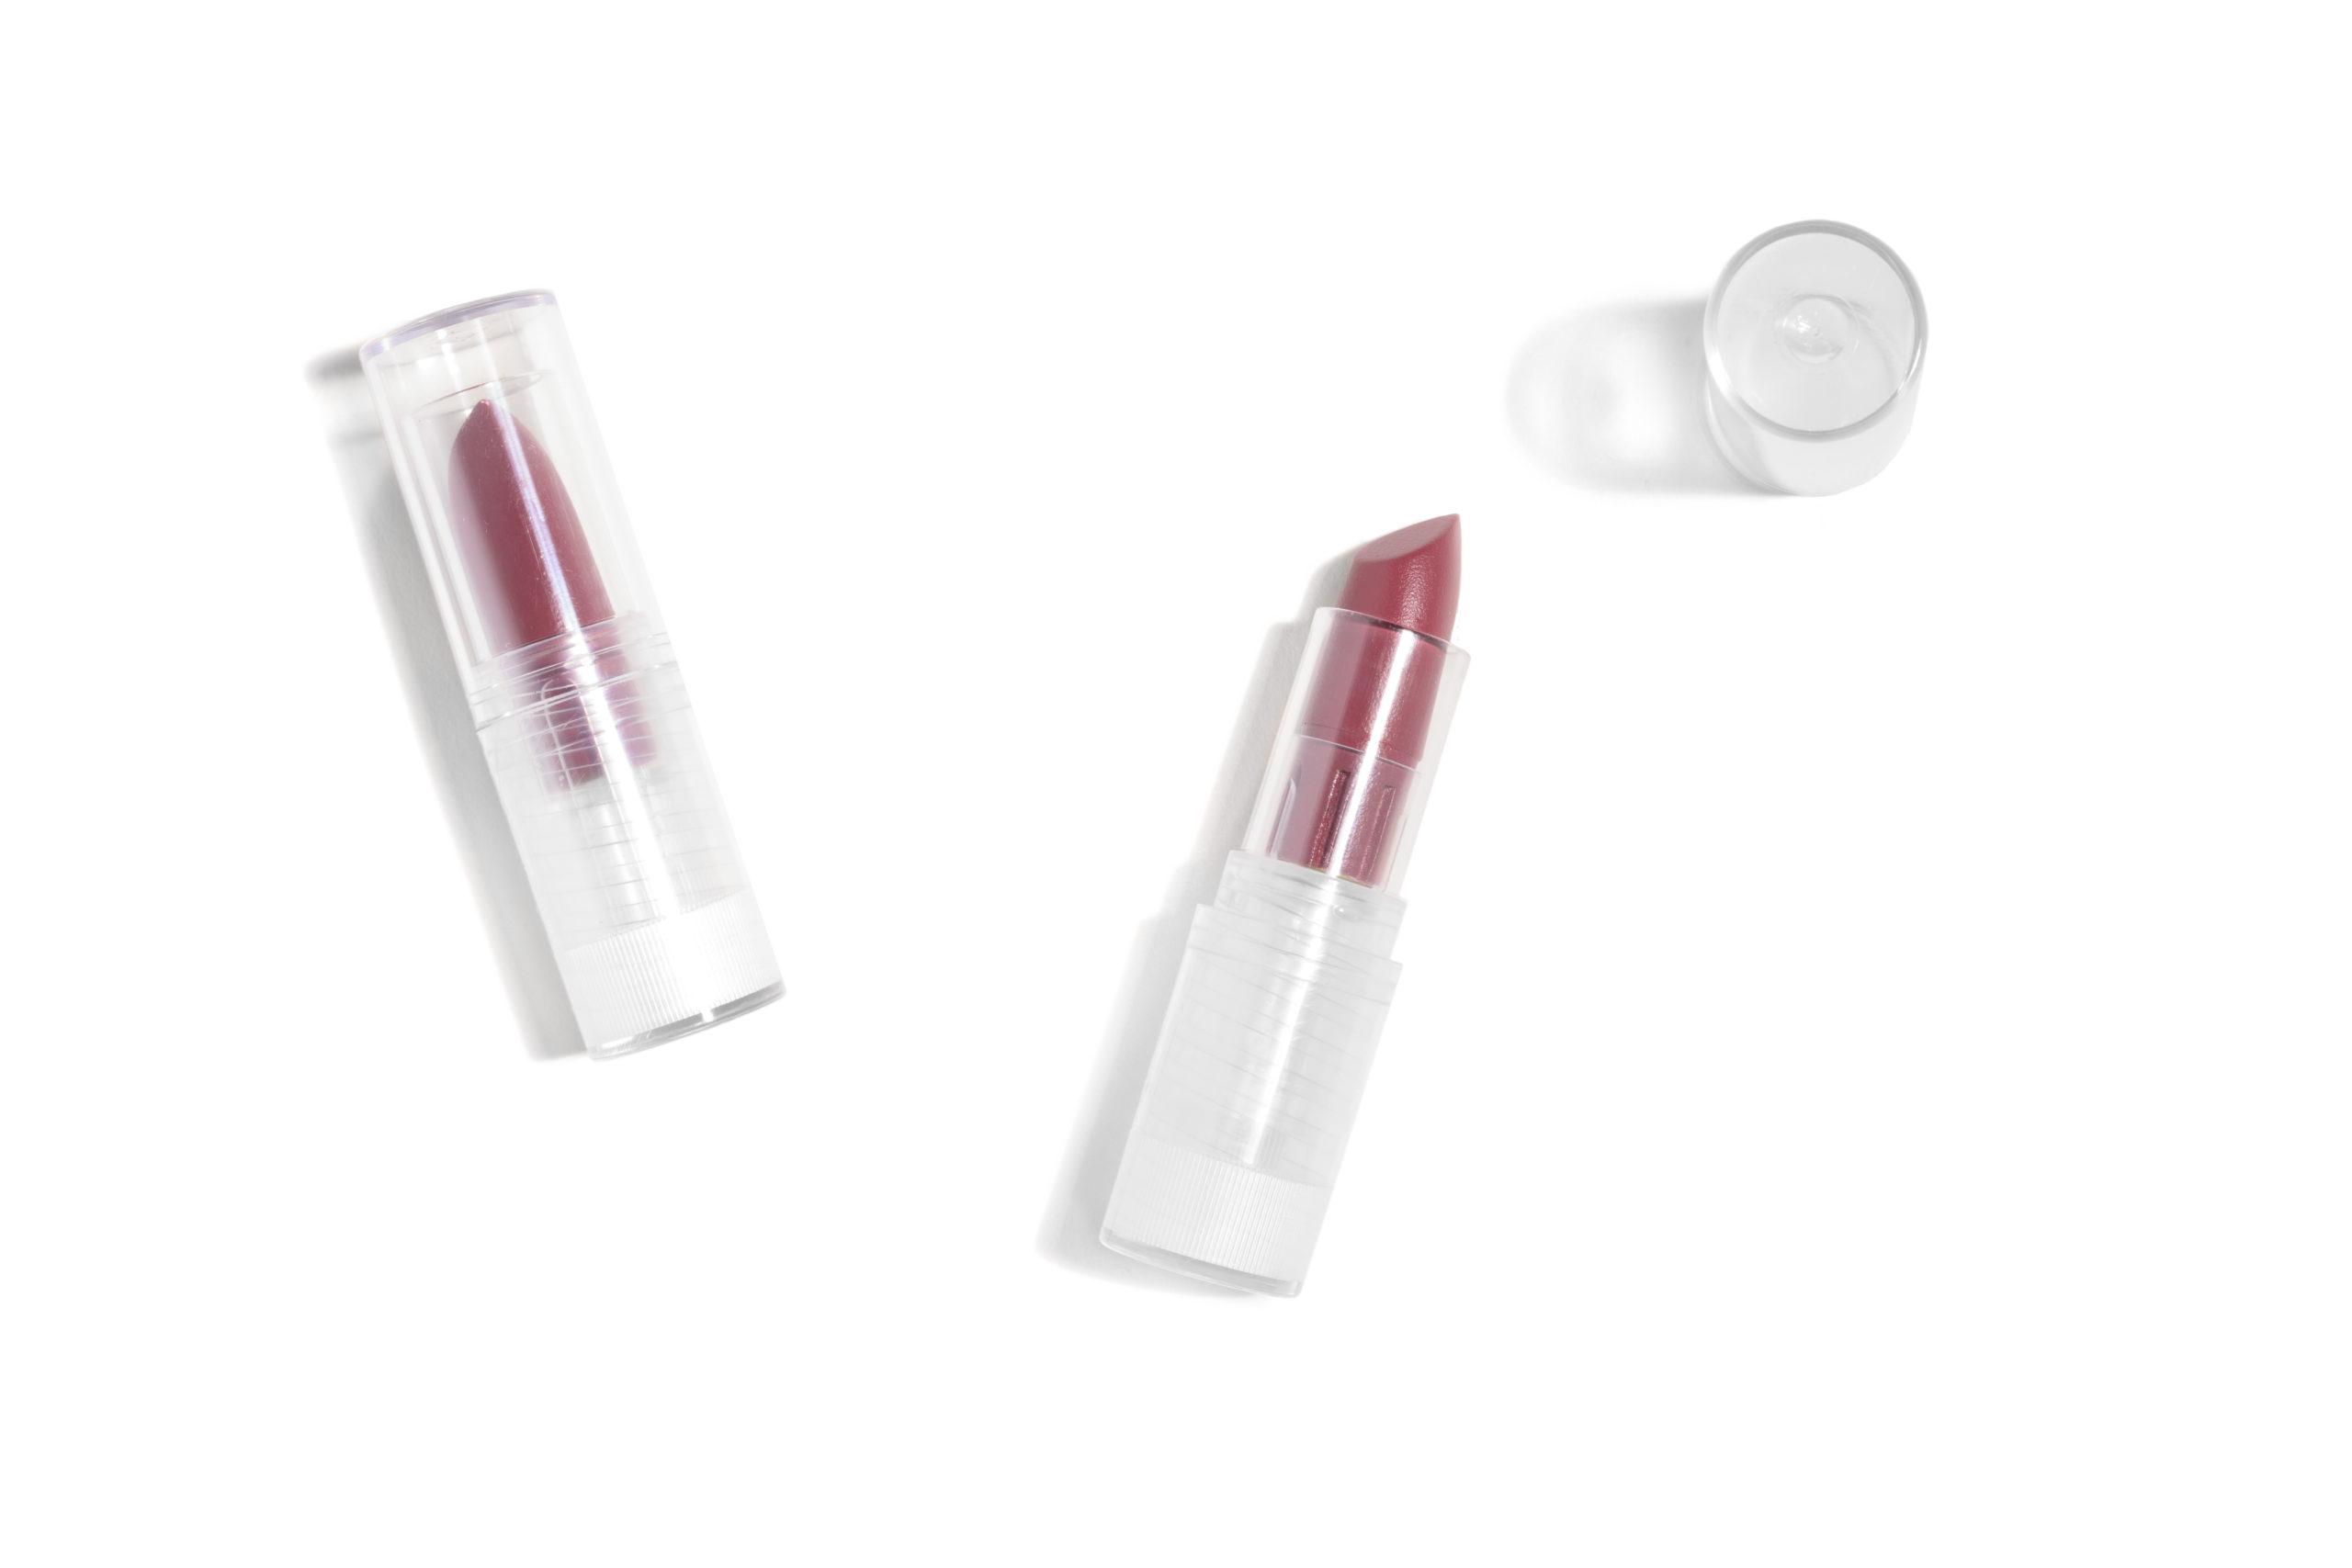 ECO Lipstick